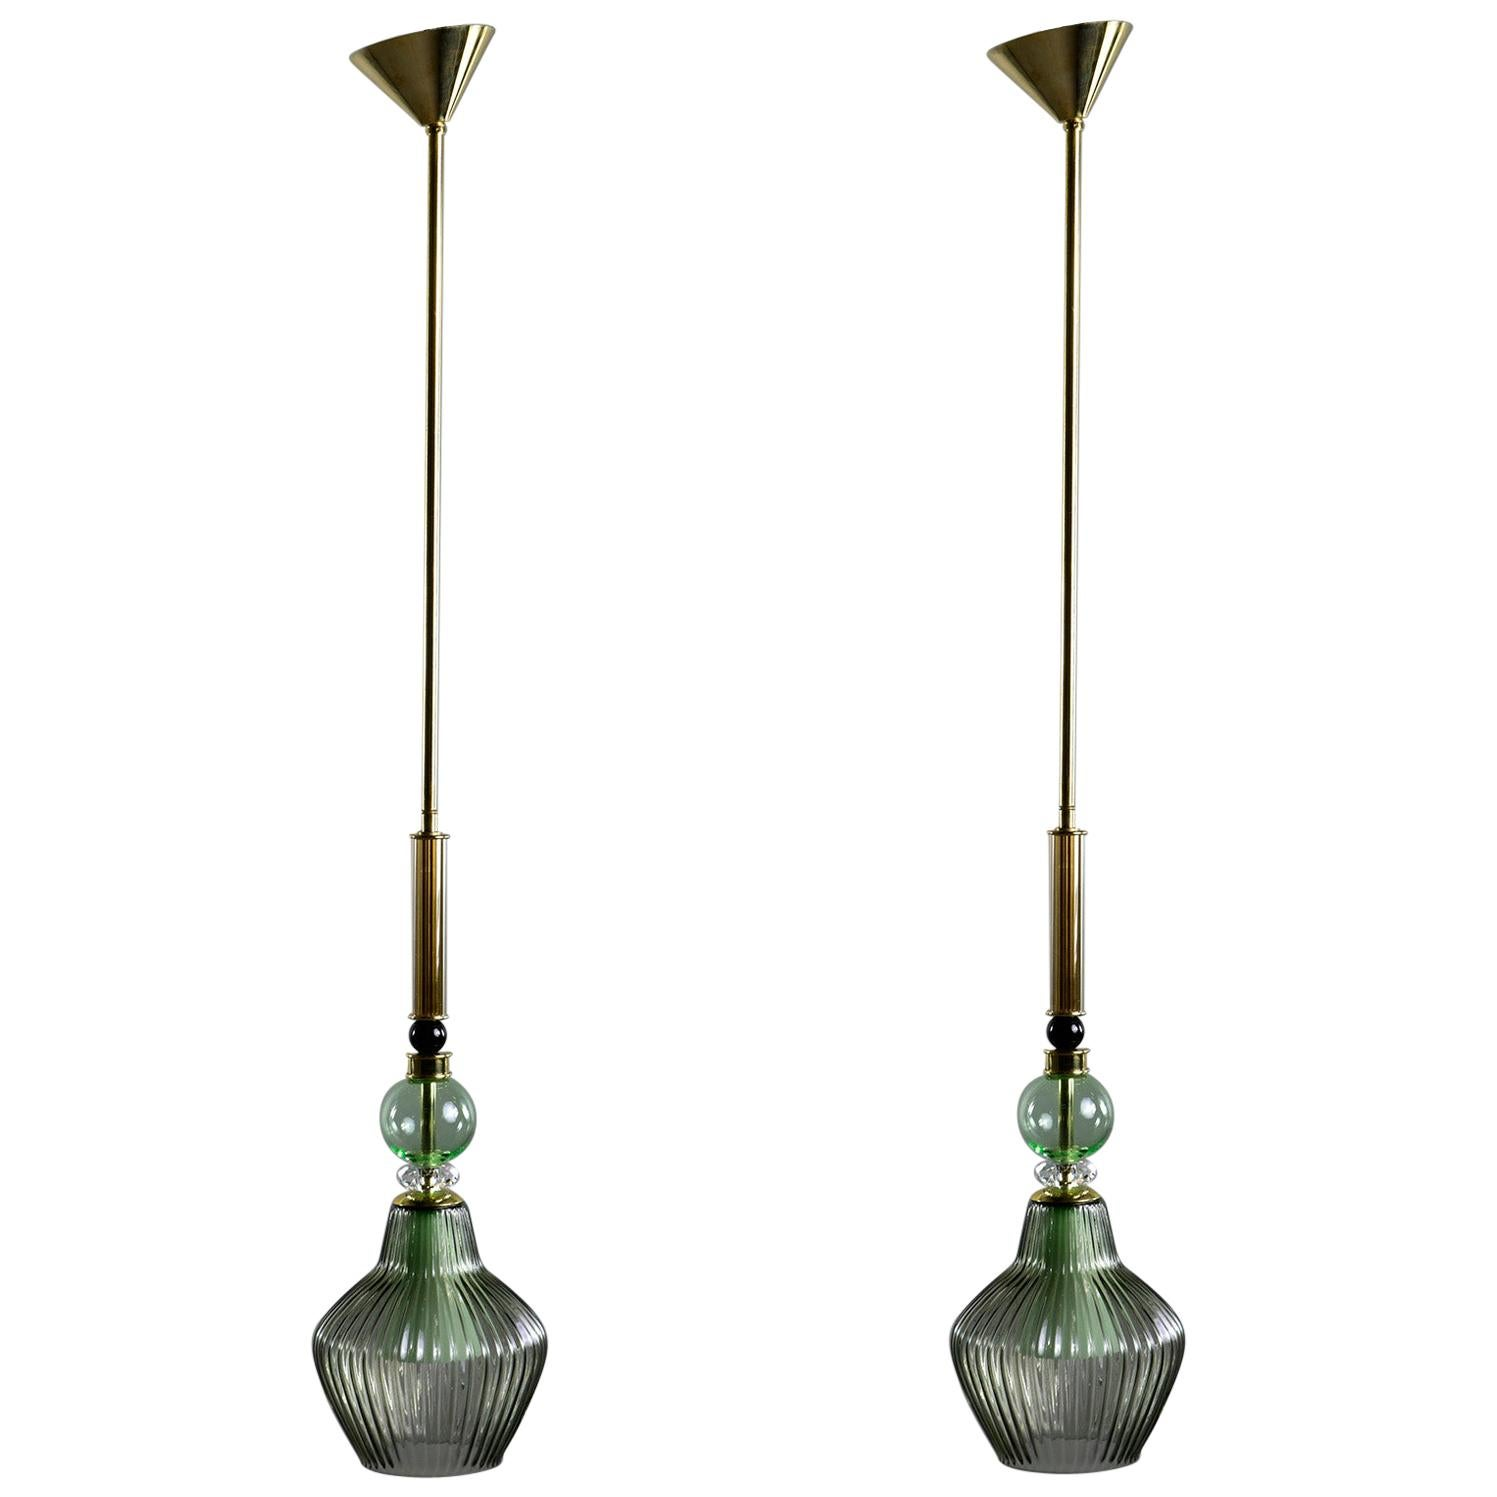 Pair of Contemporary Green Murano Glass Pendant Lights